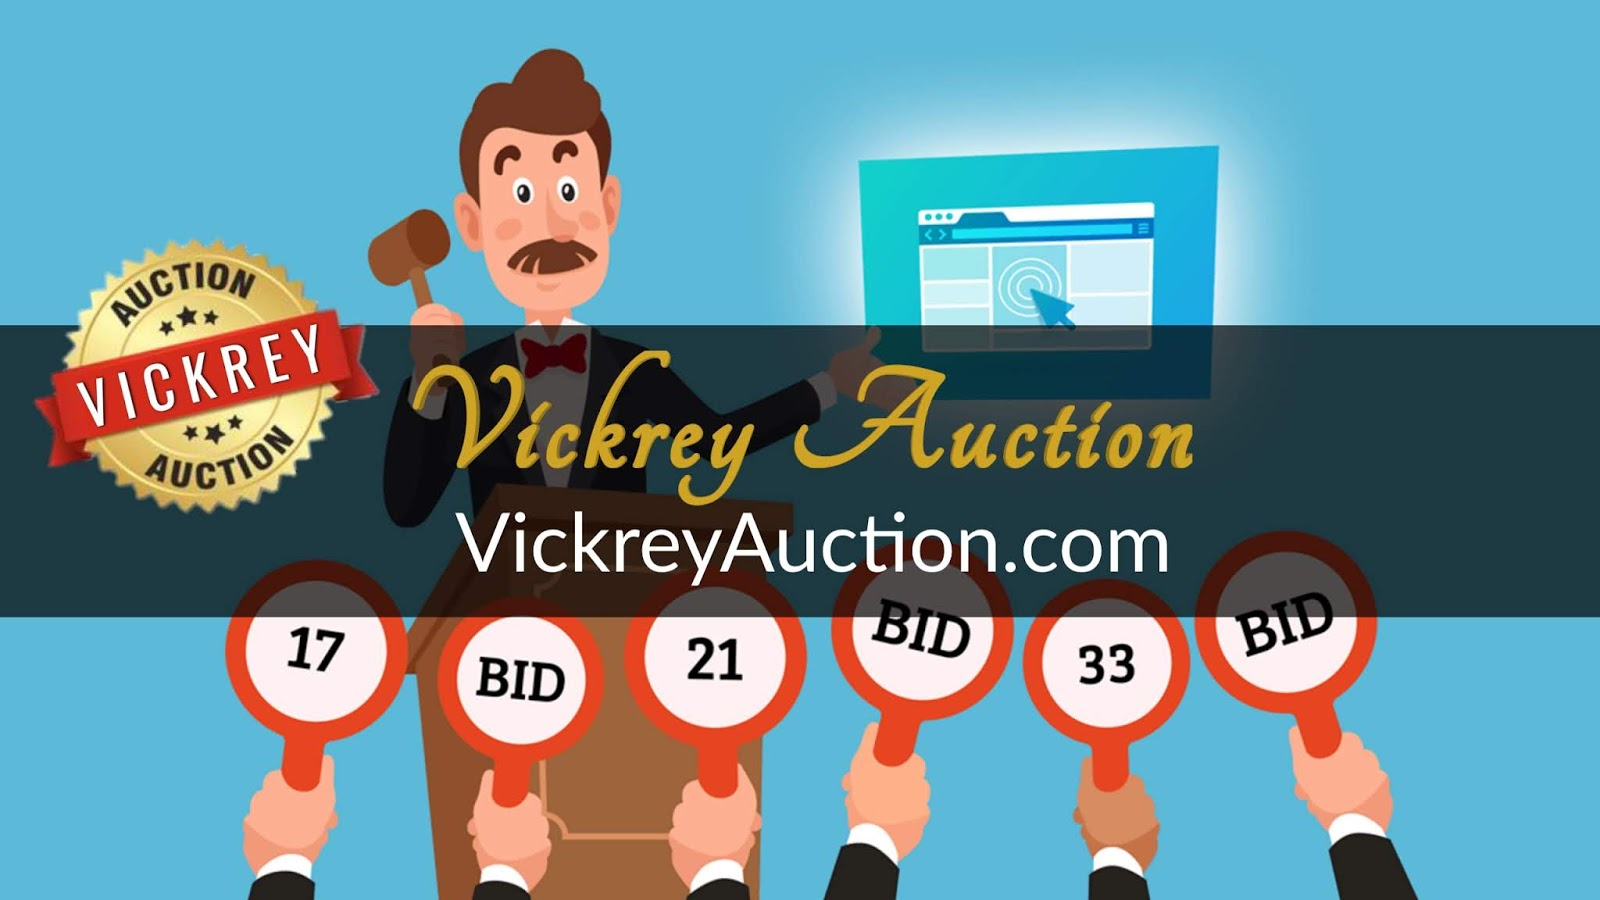 VickreyAuction.com